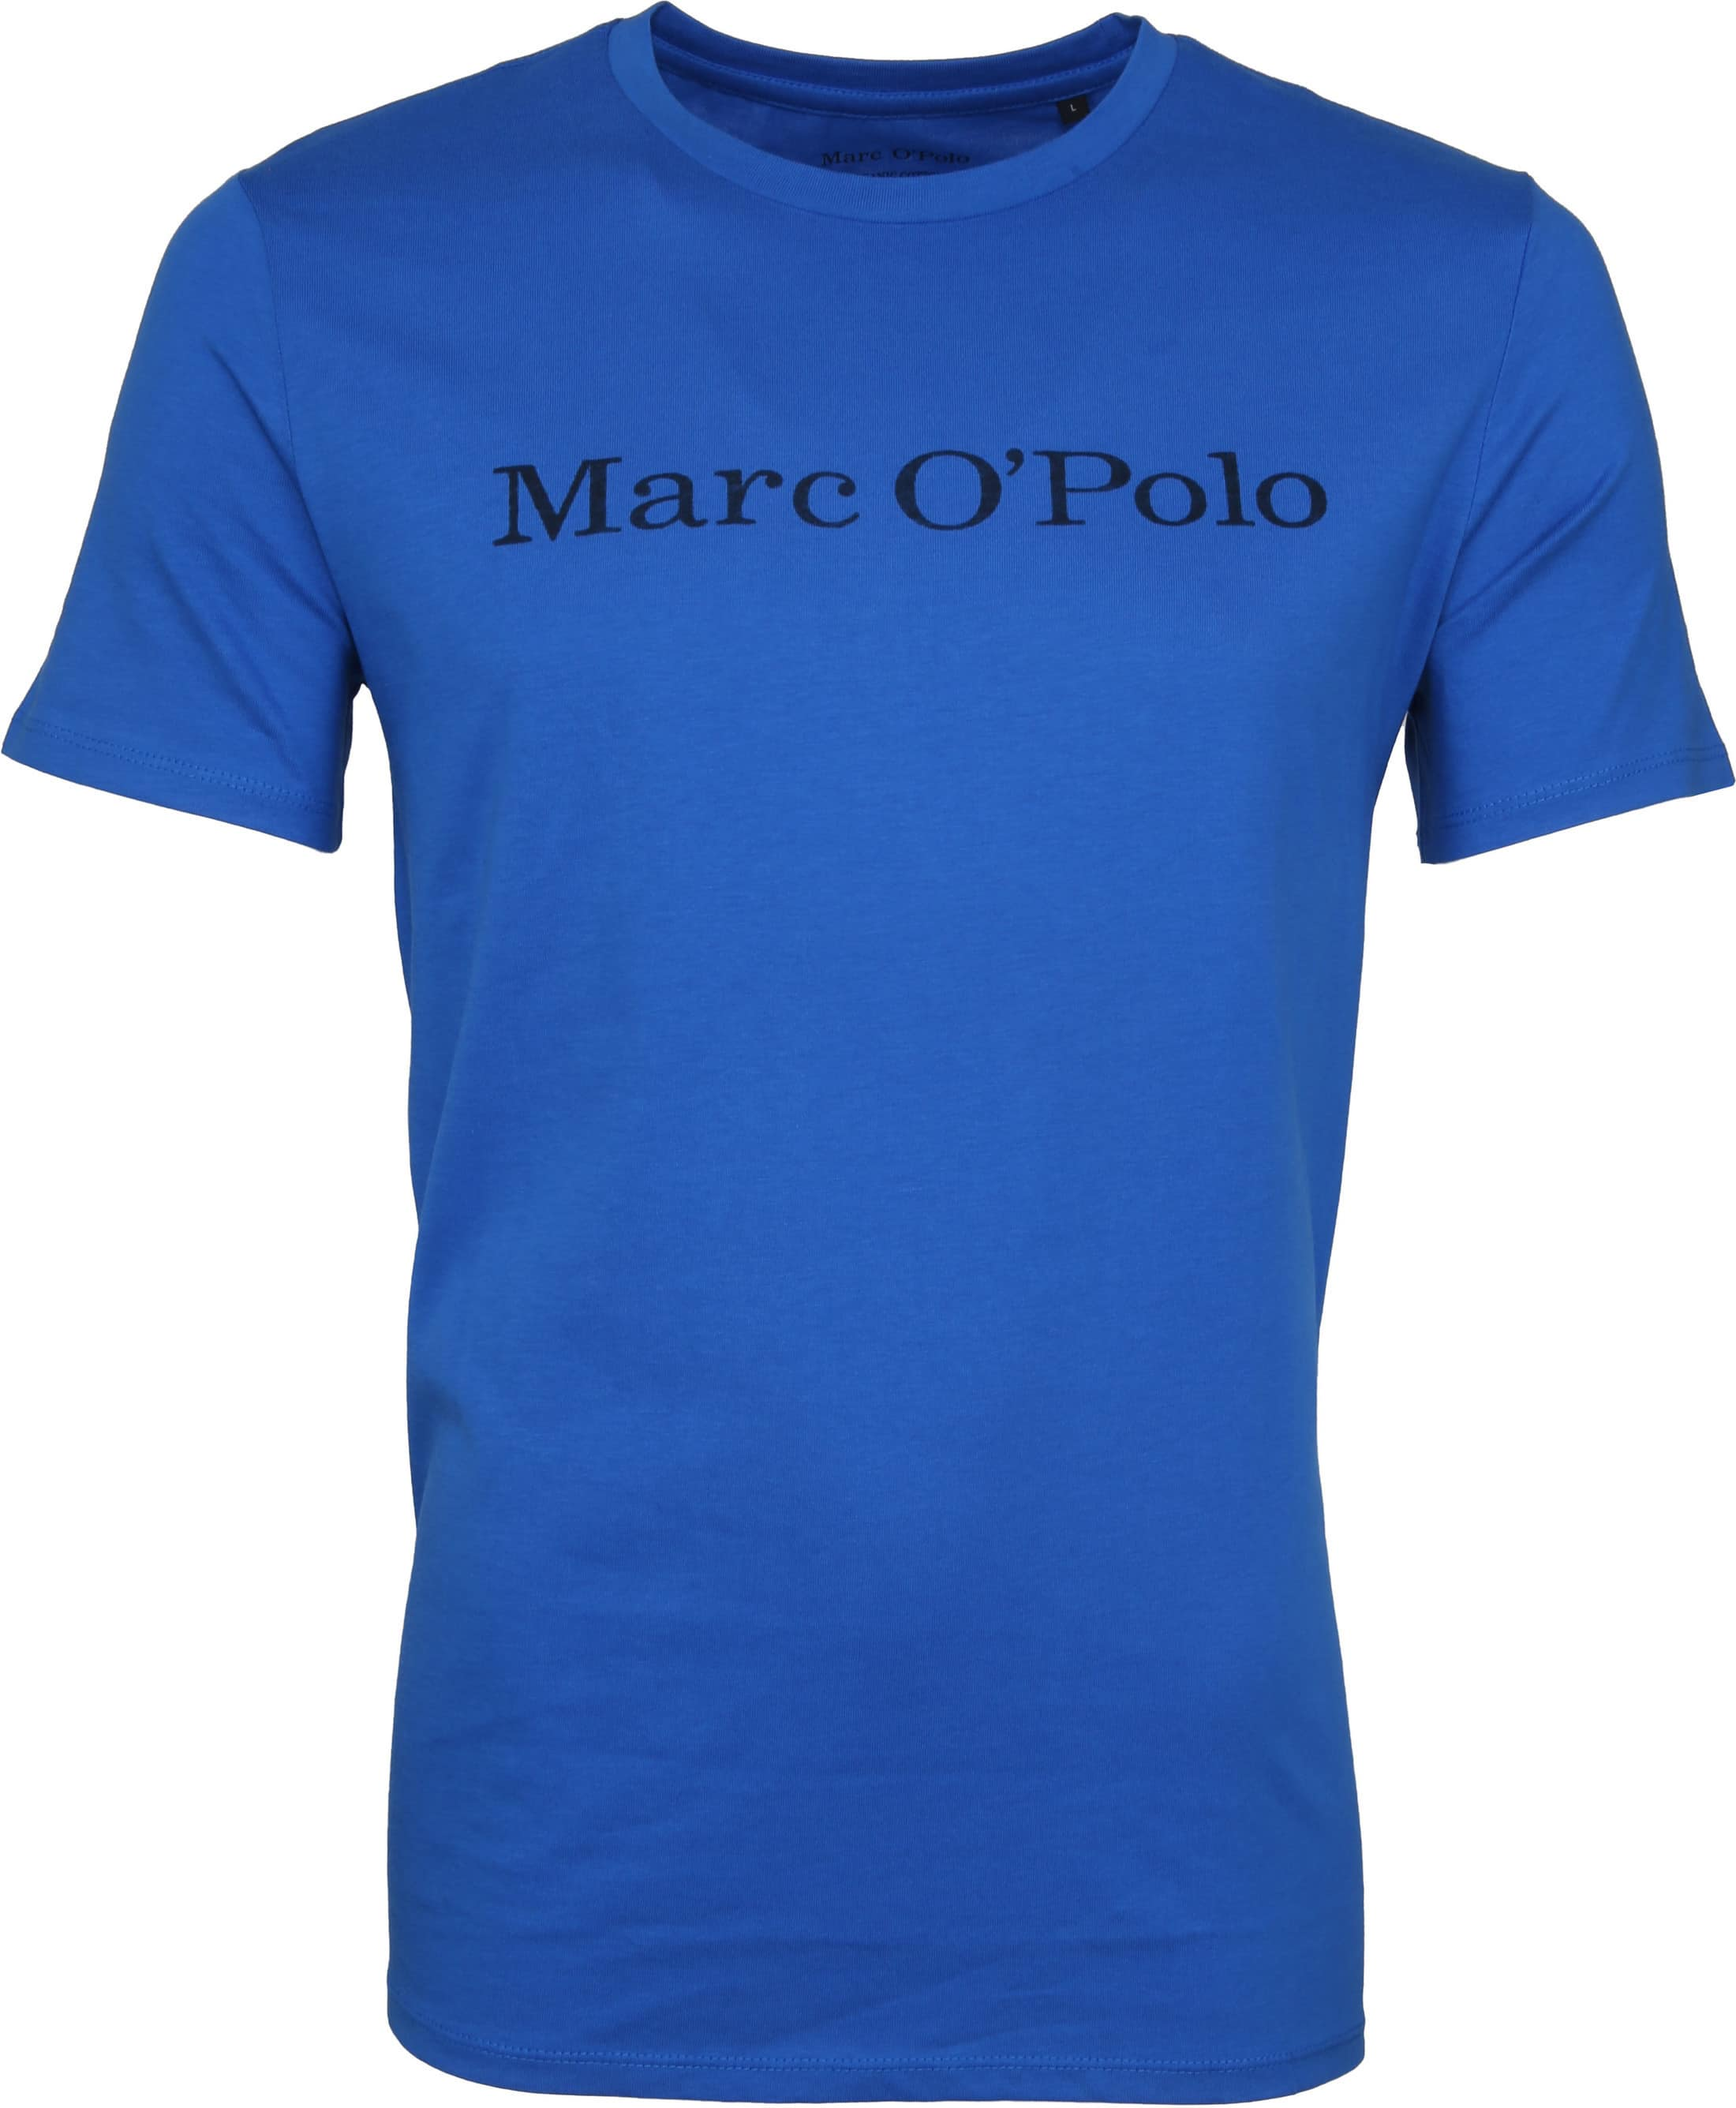 Marc O'Polo T-Shirt Victoria Blue foto 0